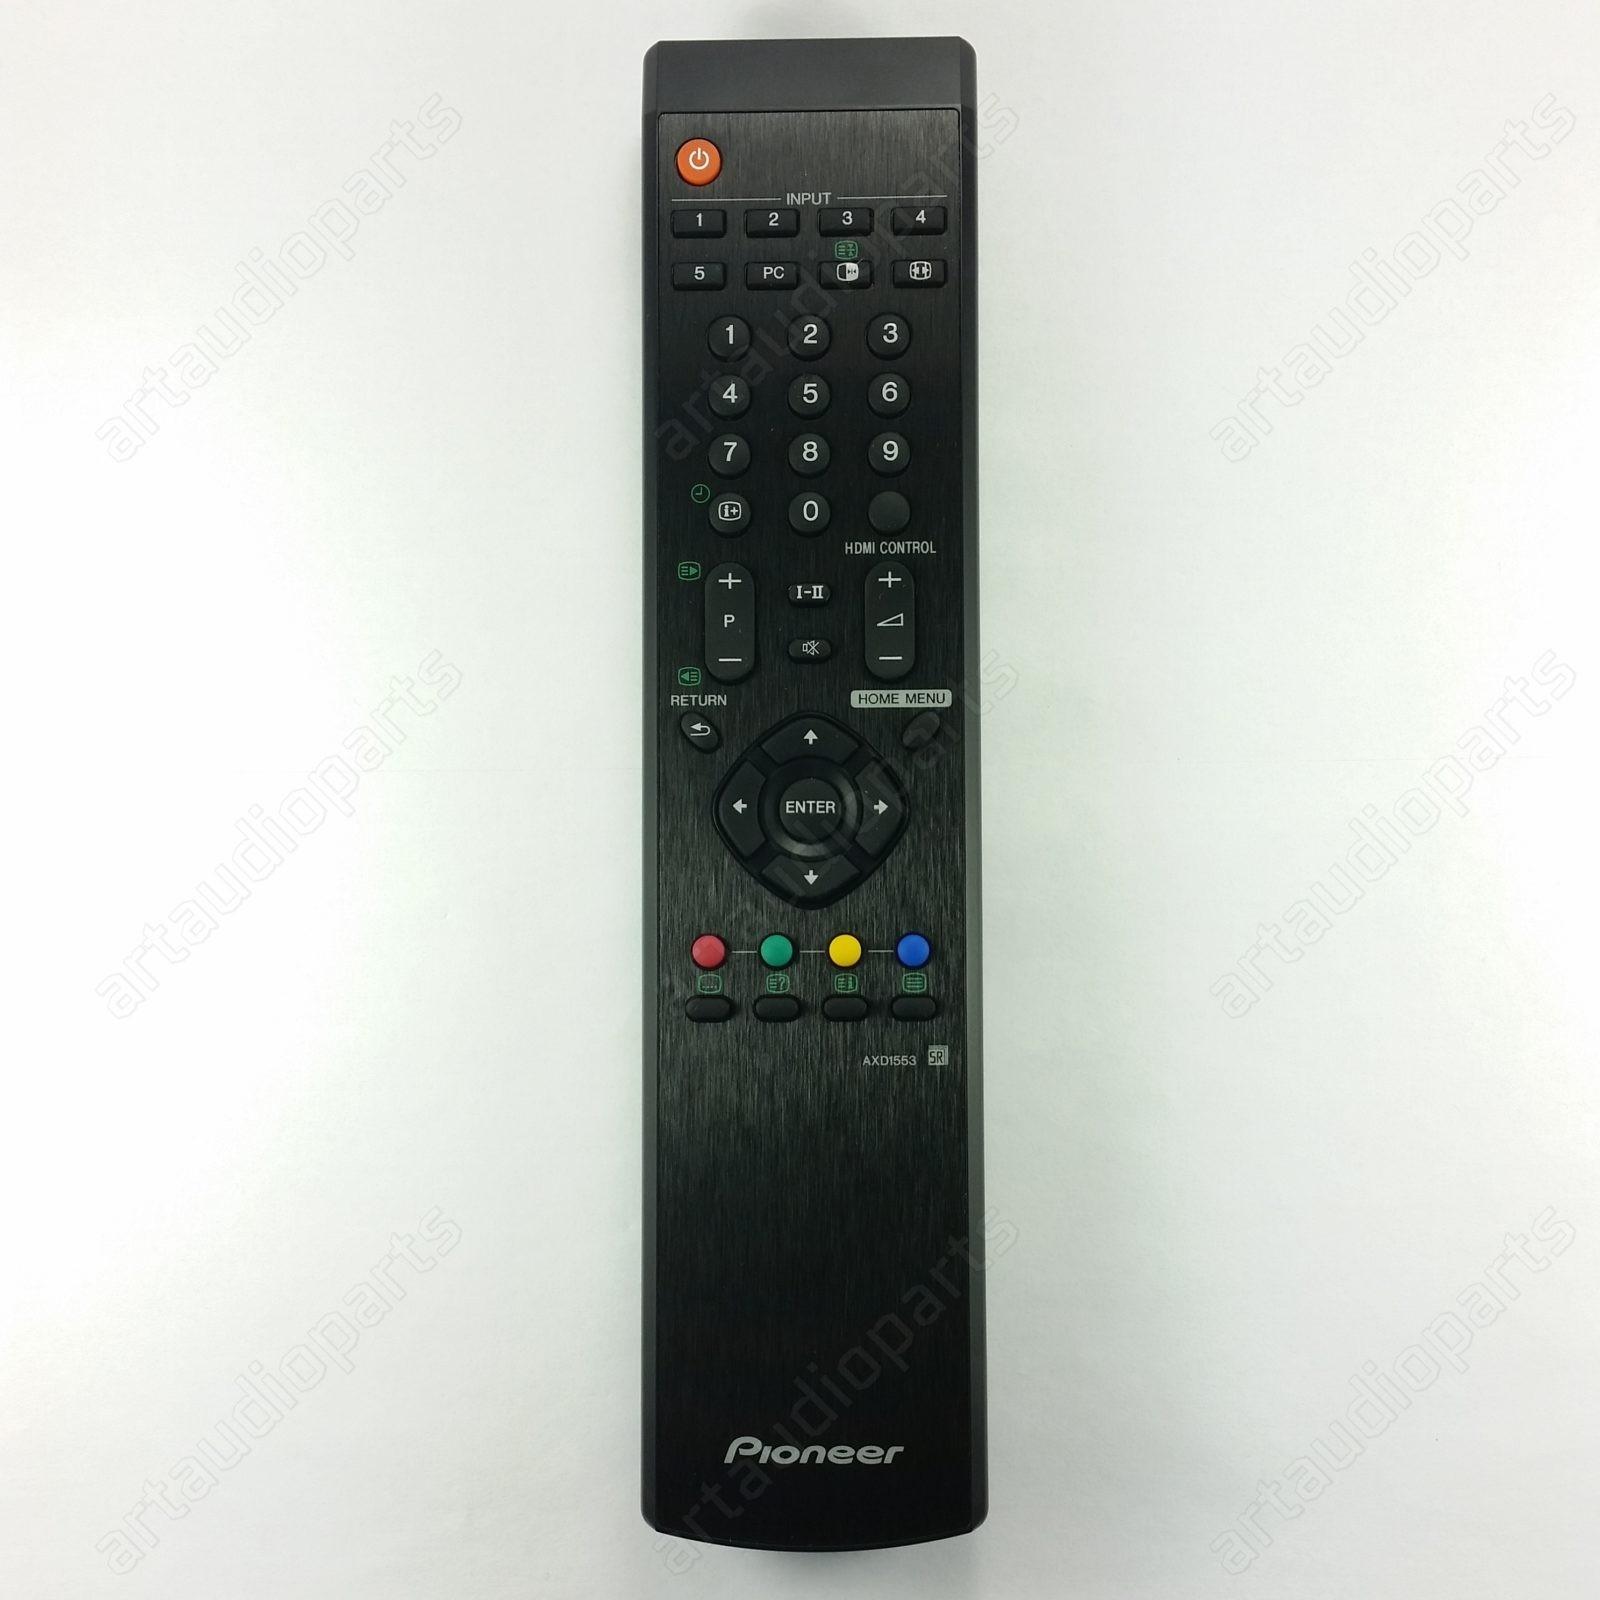 AXD1553 Remote Control for Pioneer PDP-4280XA PDP-5080XA PDP-SX4280D ...